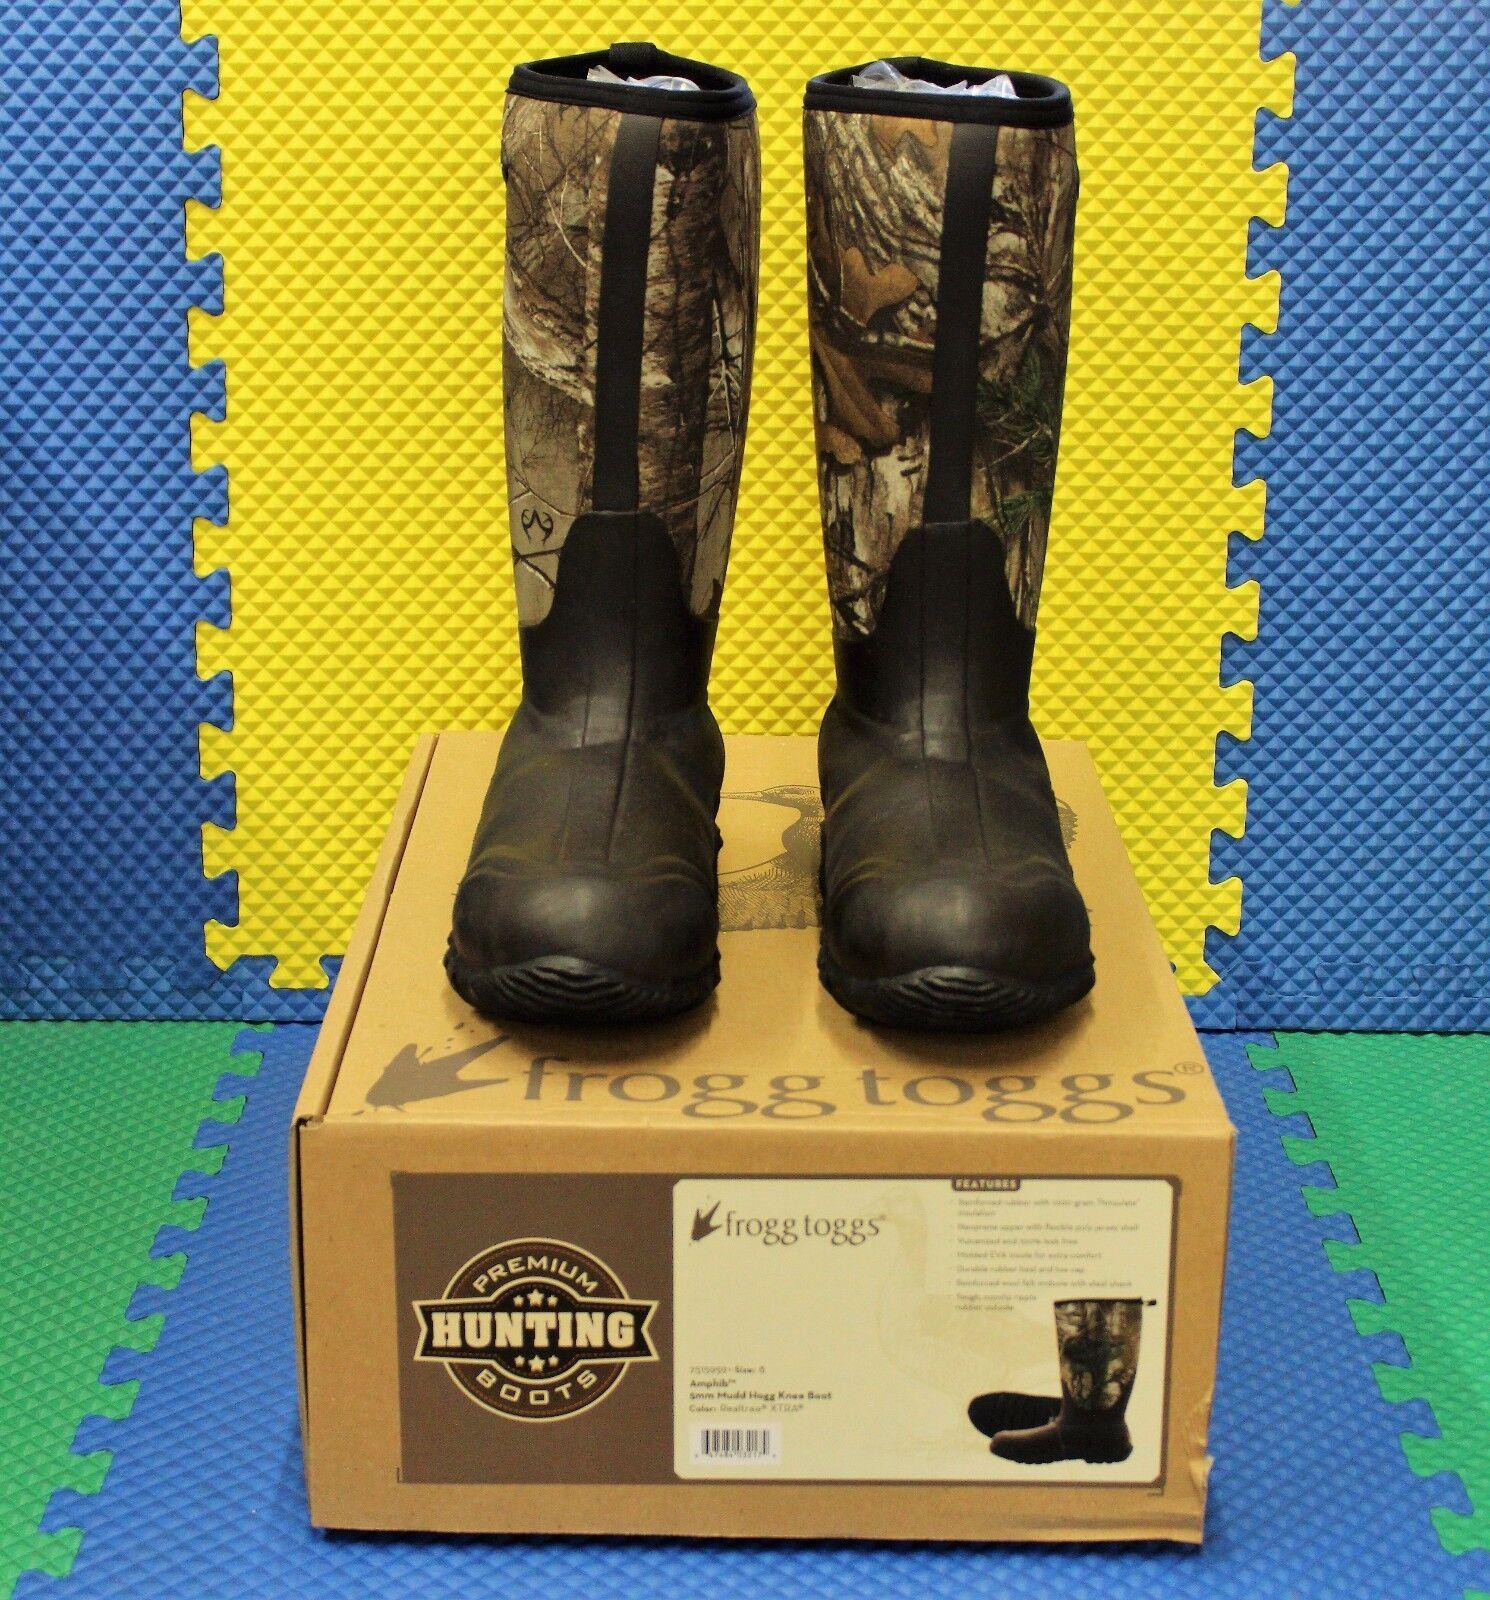 FROGG TOGGS Amphib  5mm Mudd Hogg Knee Boot Realtree XTRA 2515959 CHOOSE SIZE  new listing